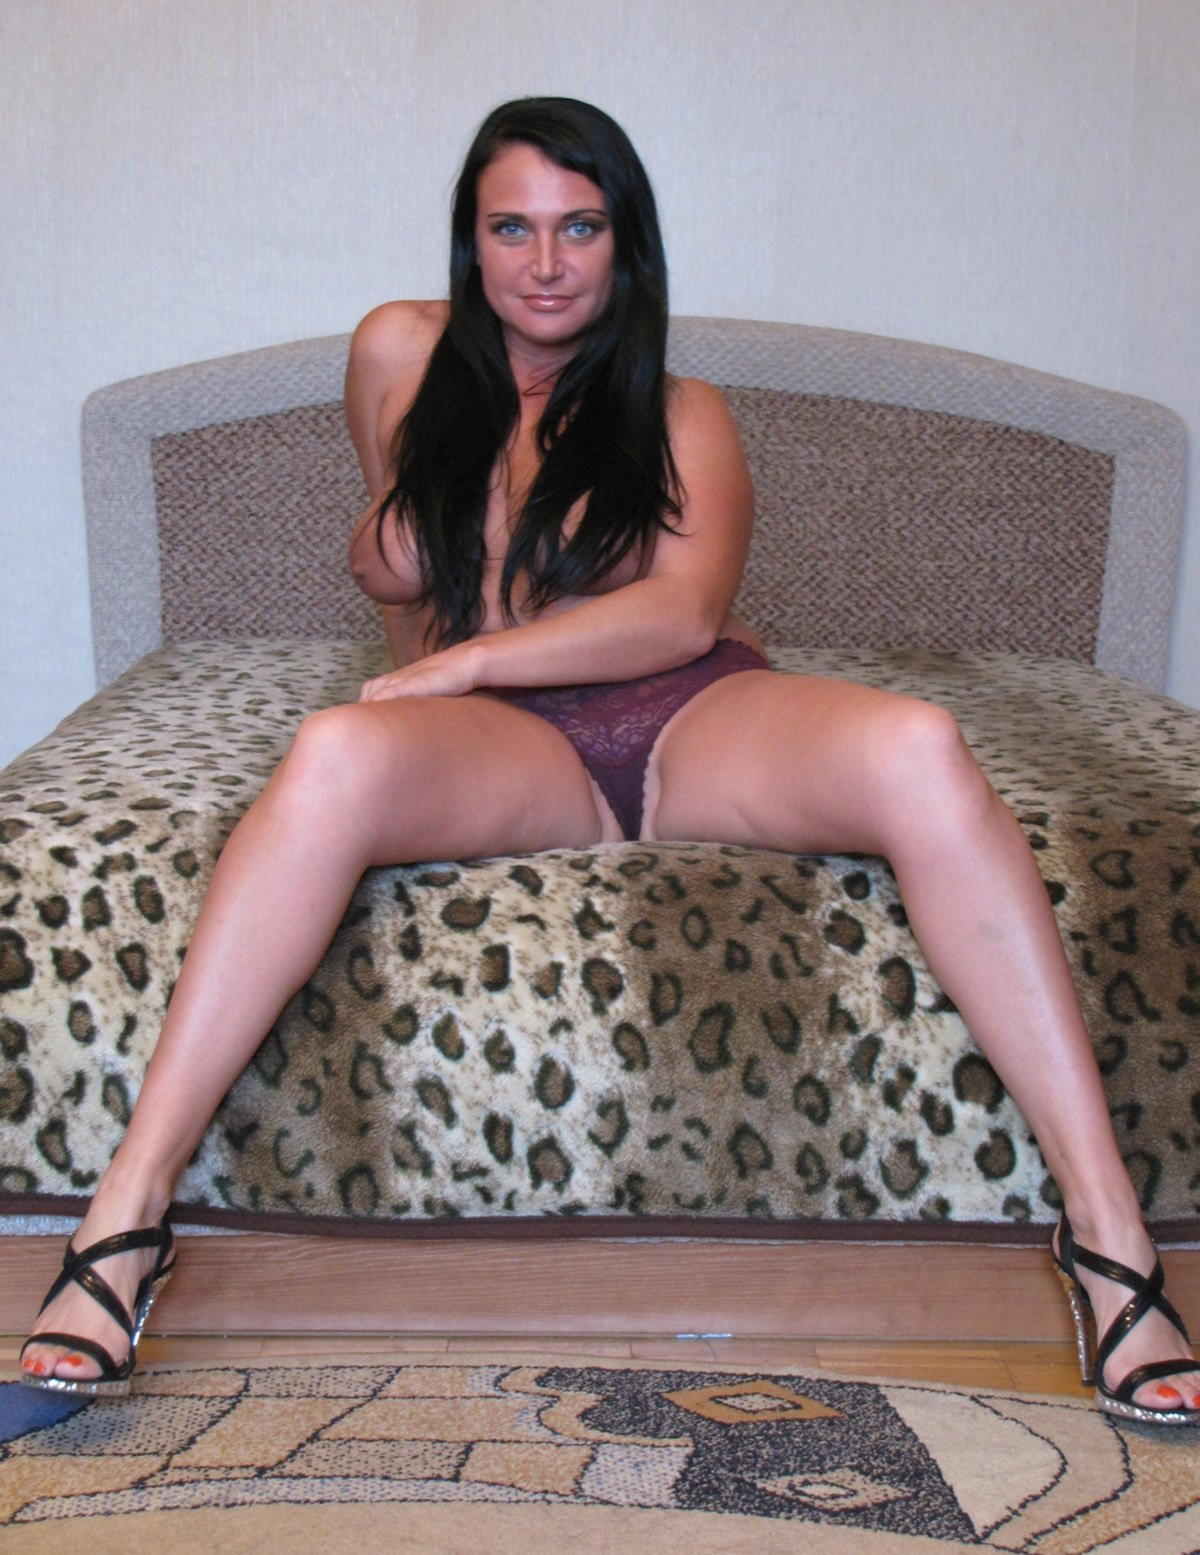 Цена проститутки зеленоград